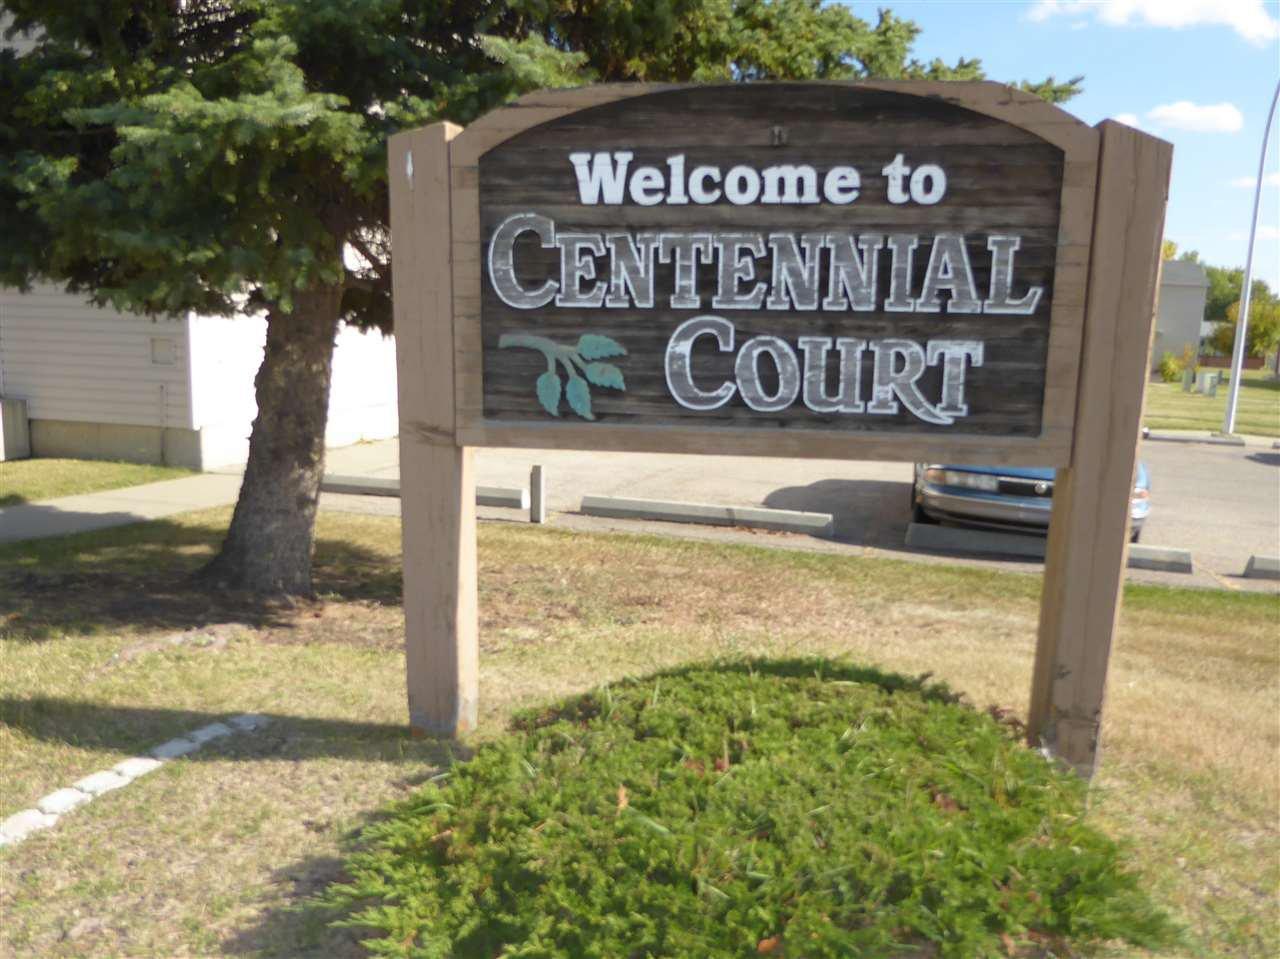 Main Photo: 137 Centennial Court in Edmonton: Zone 21 Townhouse for sale : MLS®# E4215659